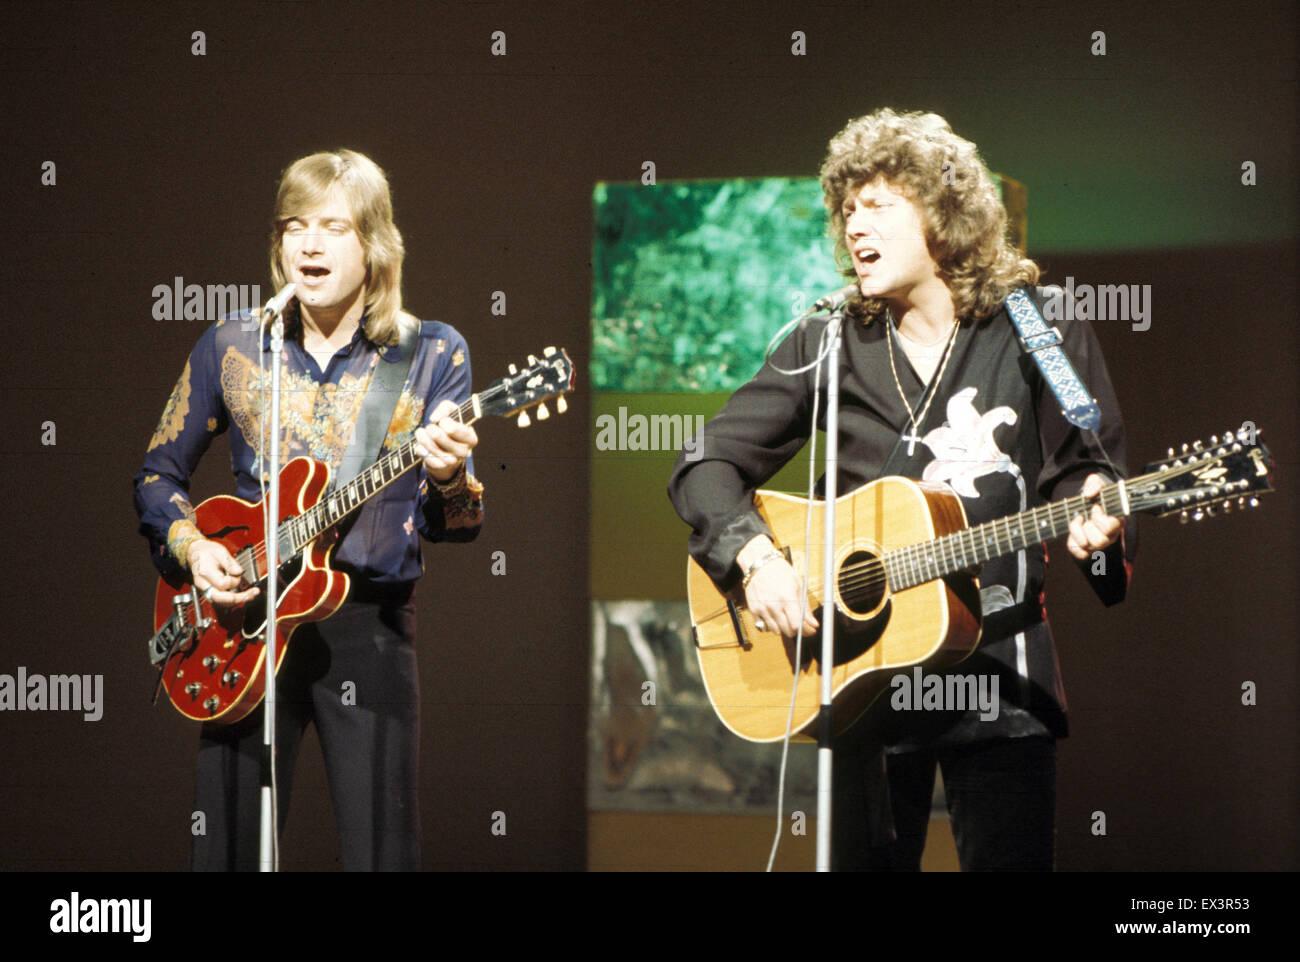 Moody Blues Uk Rock Group With Justin Hayward At Left And John Lodge Stock Photo Alamy